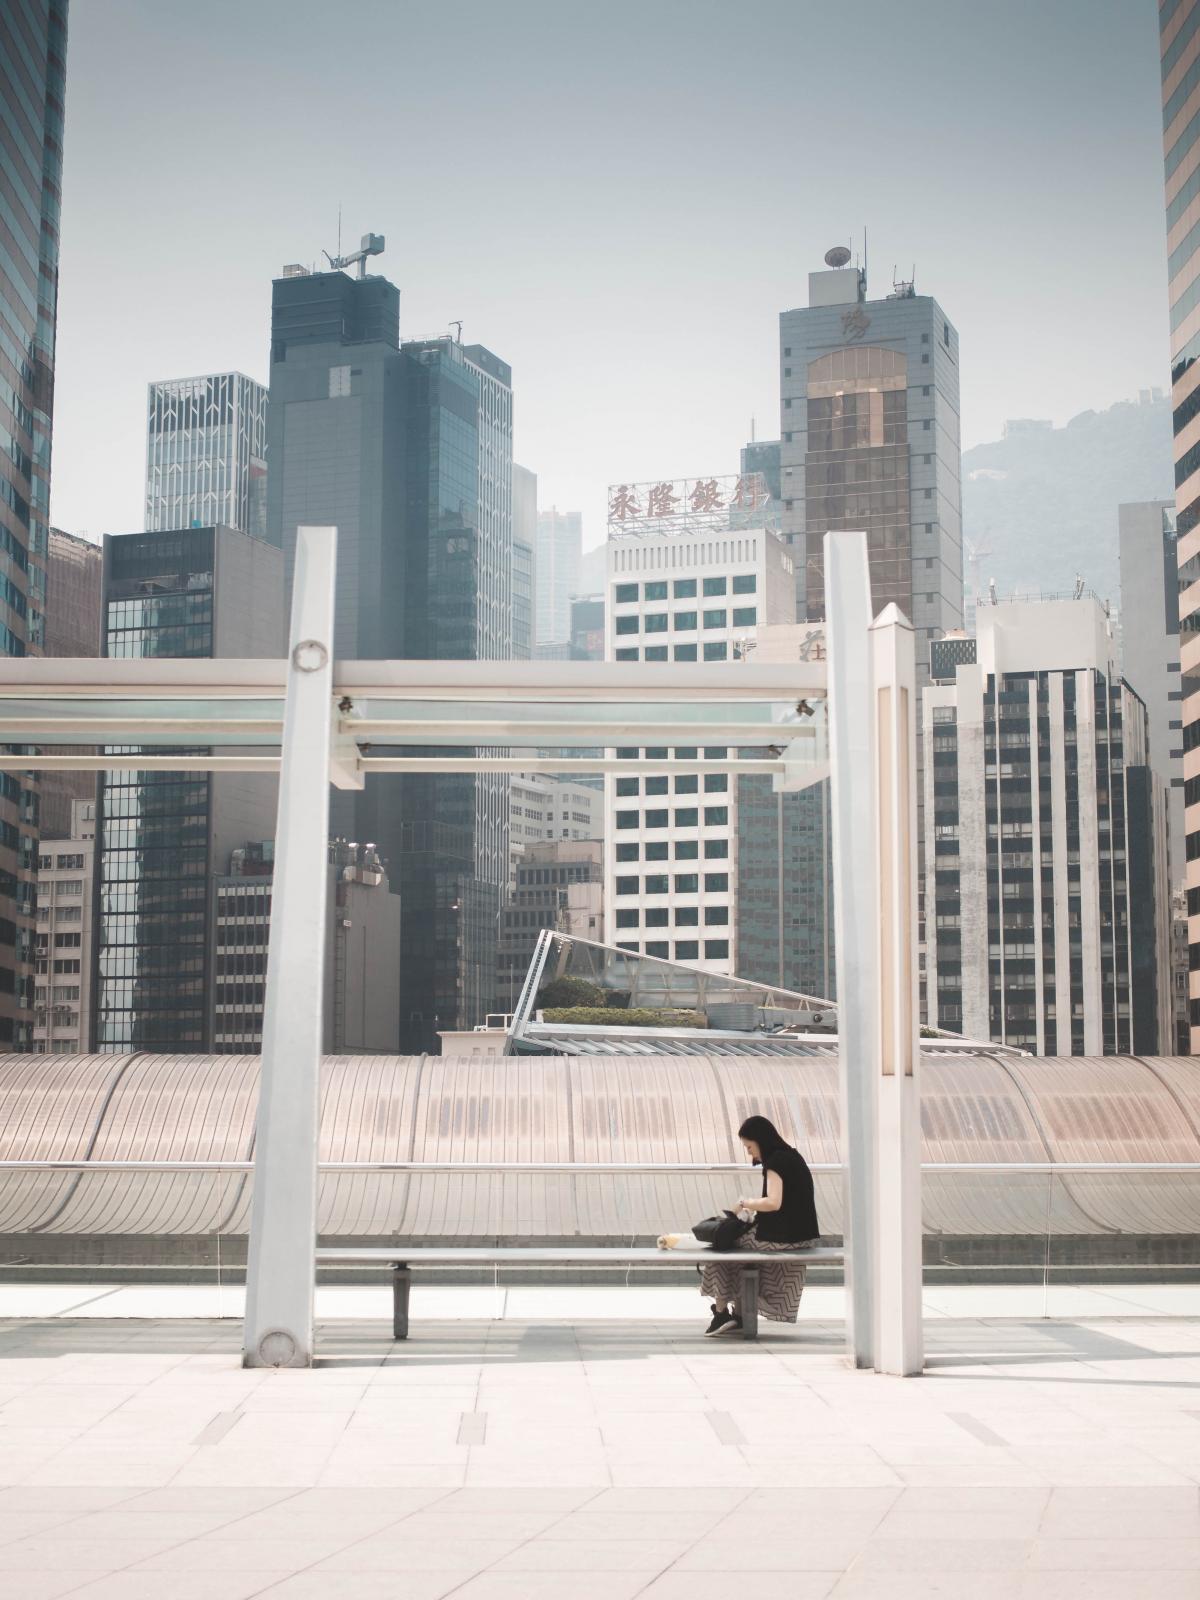 City Architecture Skyline #425230